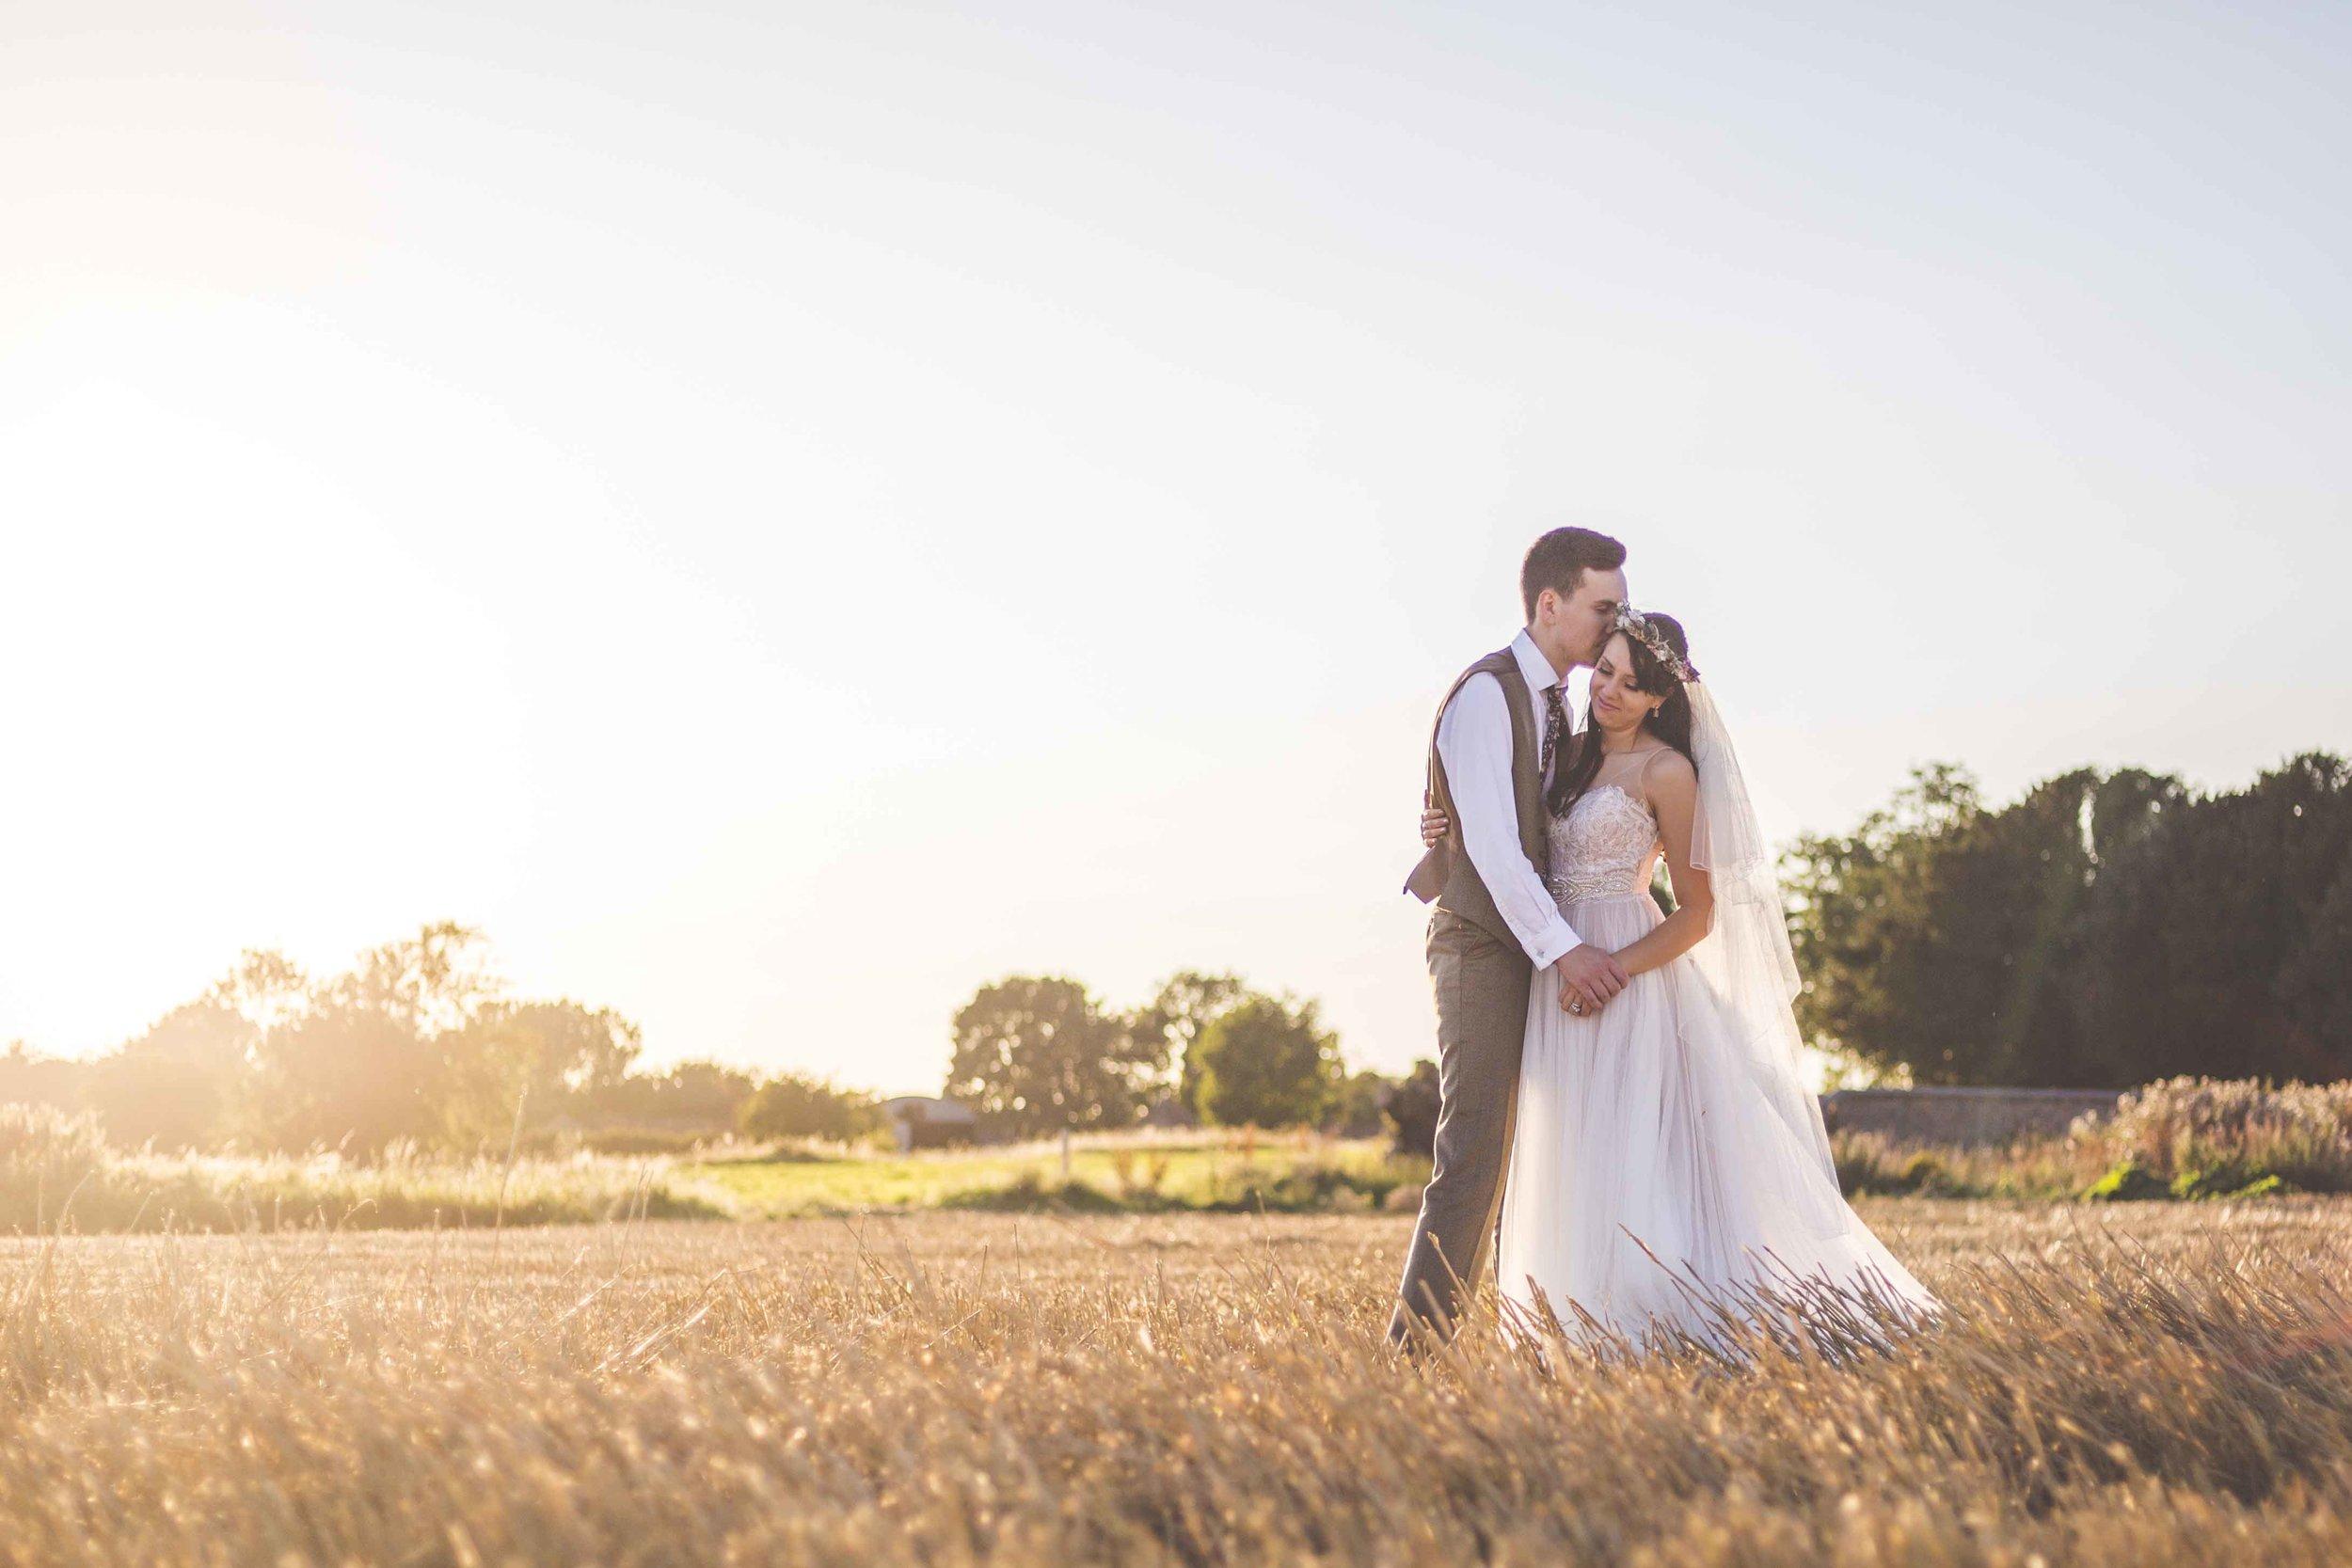 wedding photographer hull east yorkshire.jpg